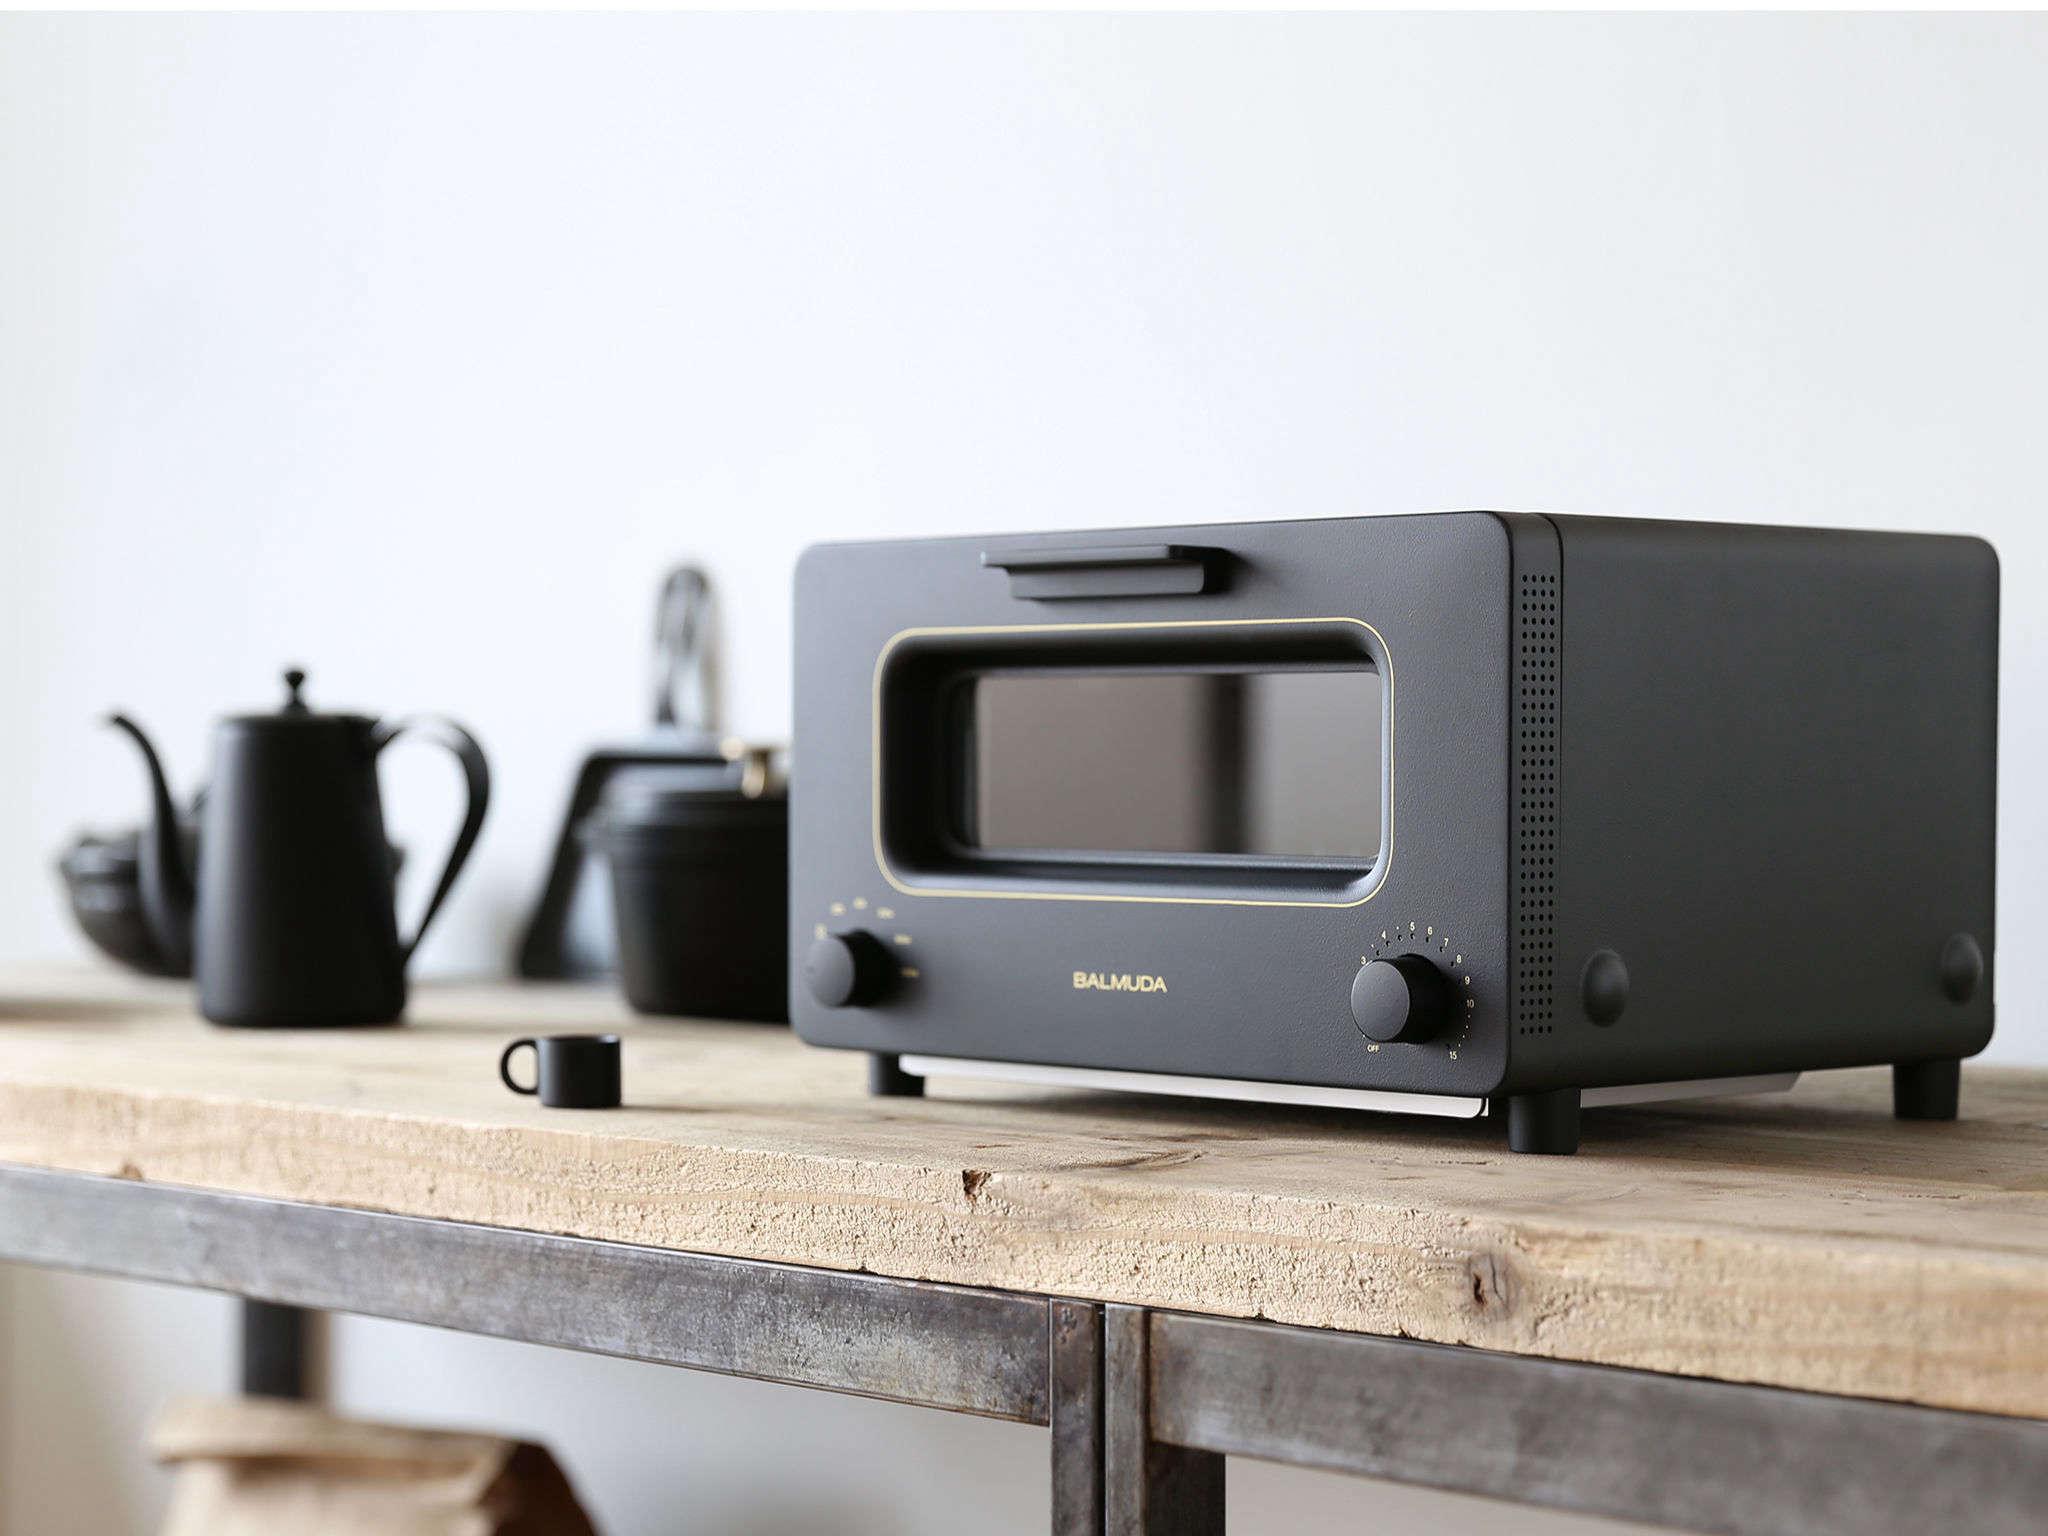 balmuda toaster oven in black 27